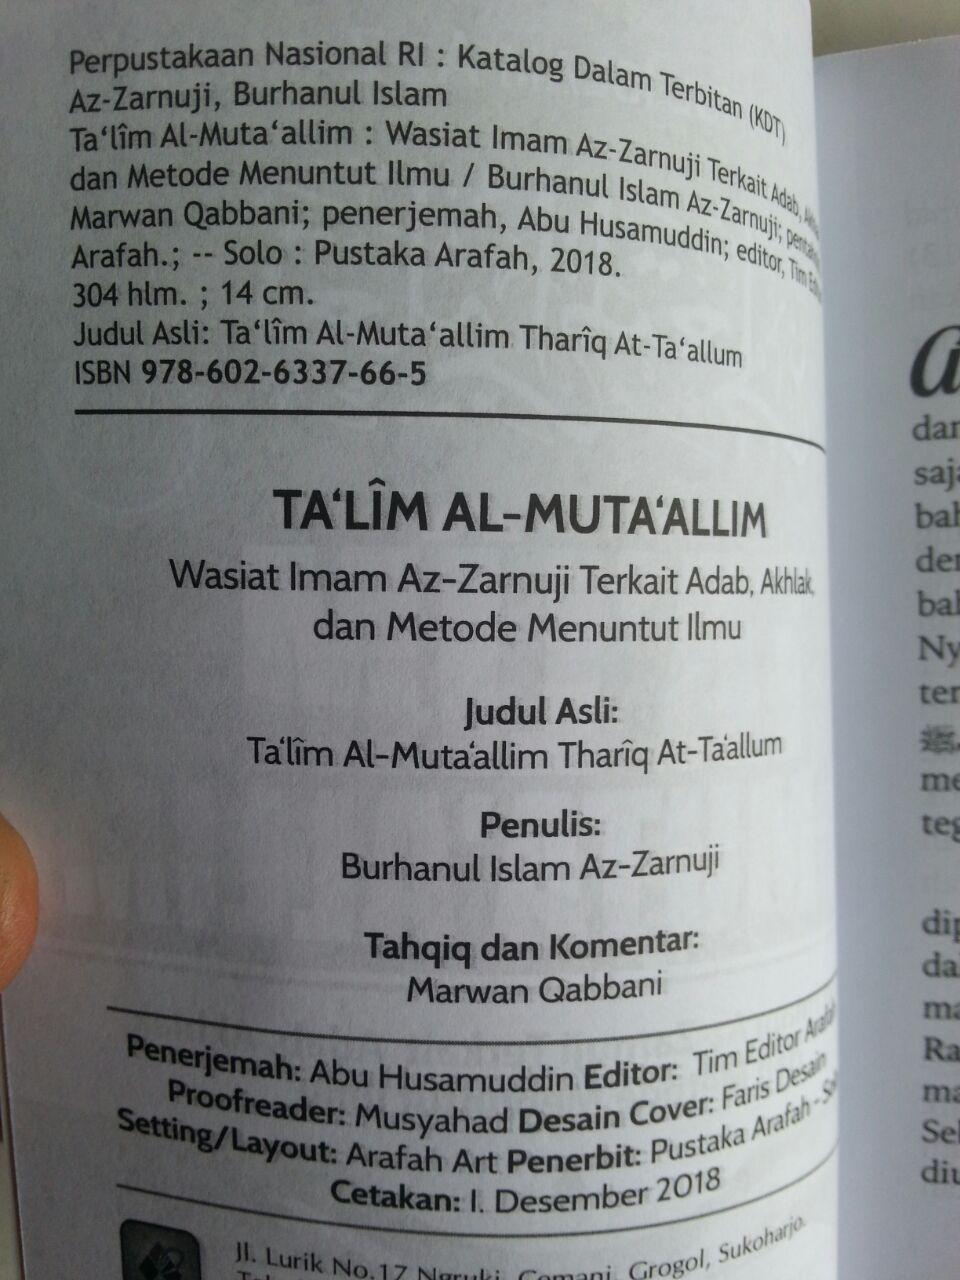 Buku Ta'lim Al-Muta'allim Wasiat Terkait Adab Akhlak Menuntut Ilmu isi 2